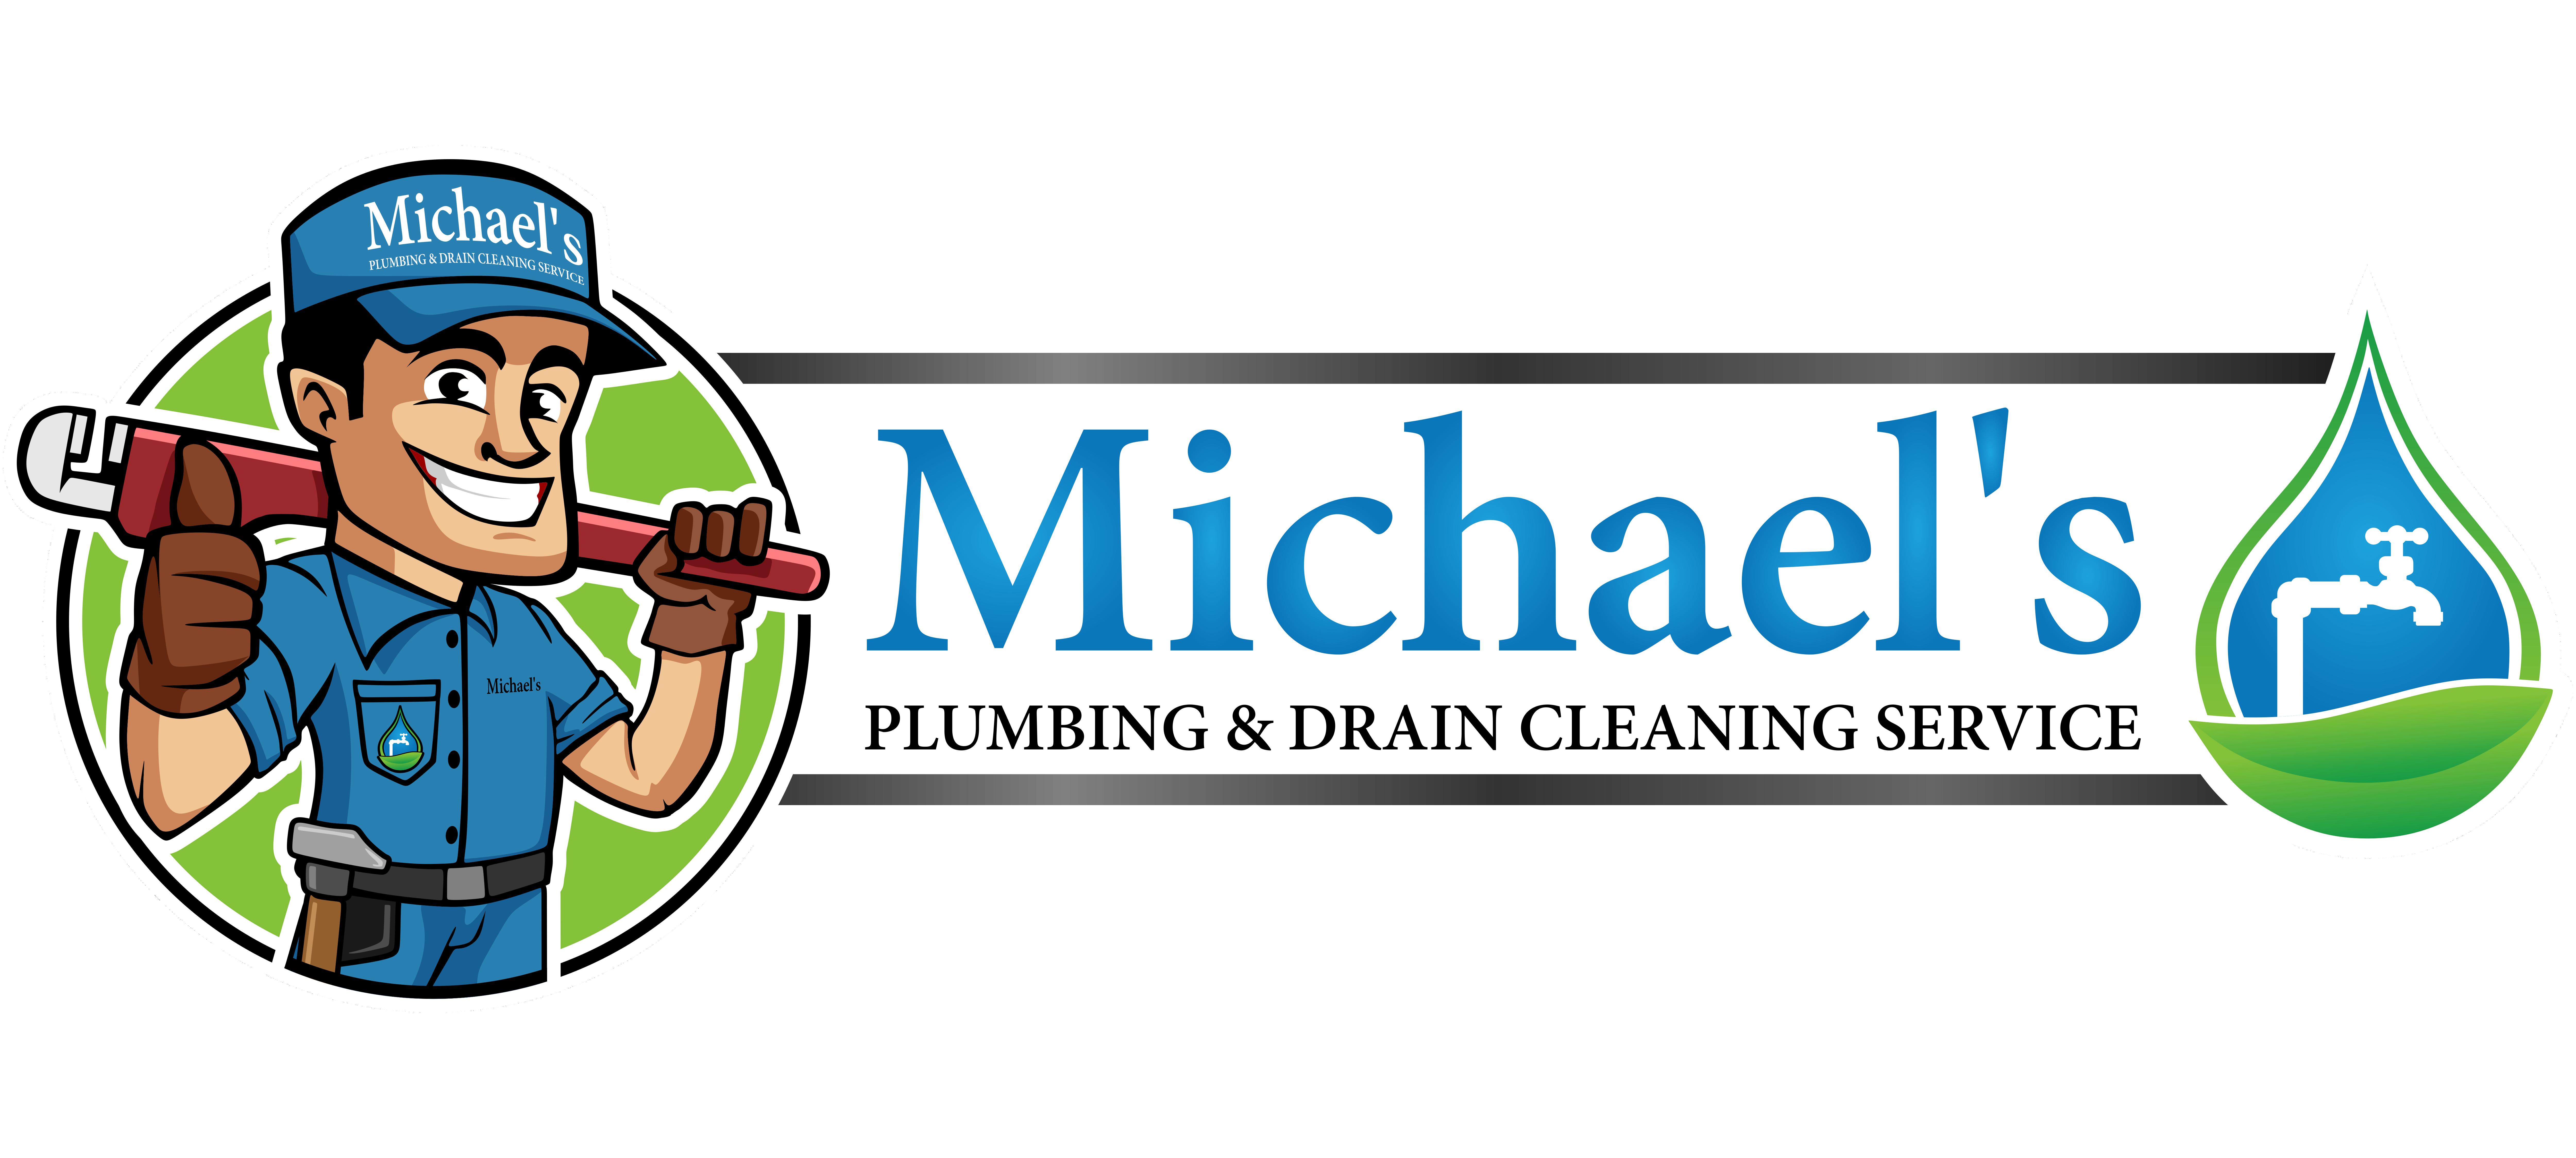 Michael's Plumbing logo